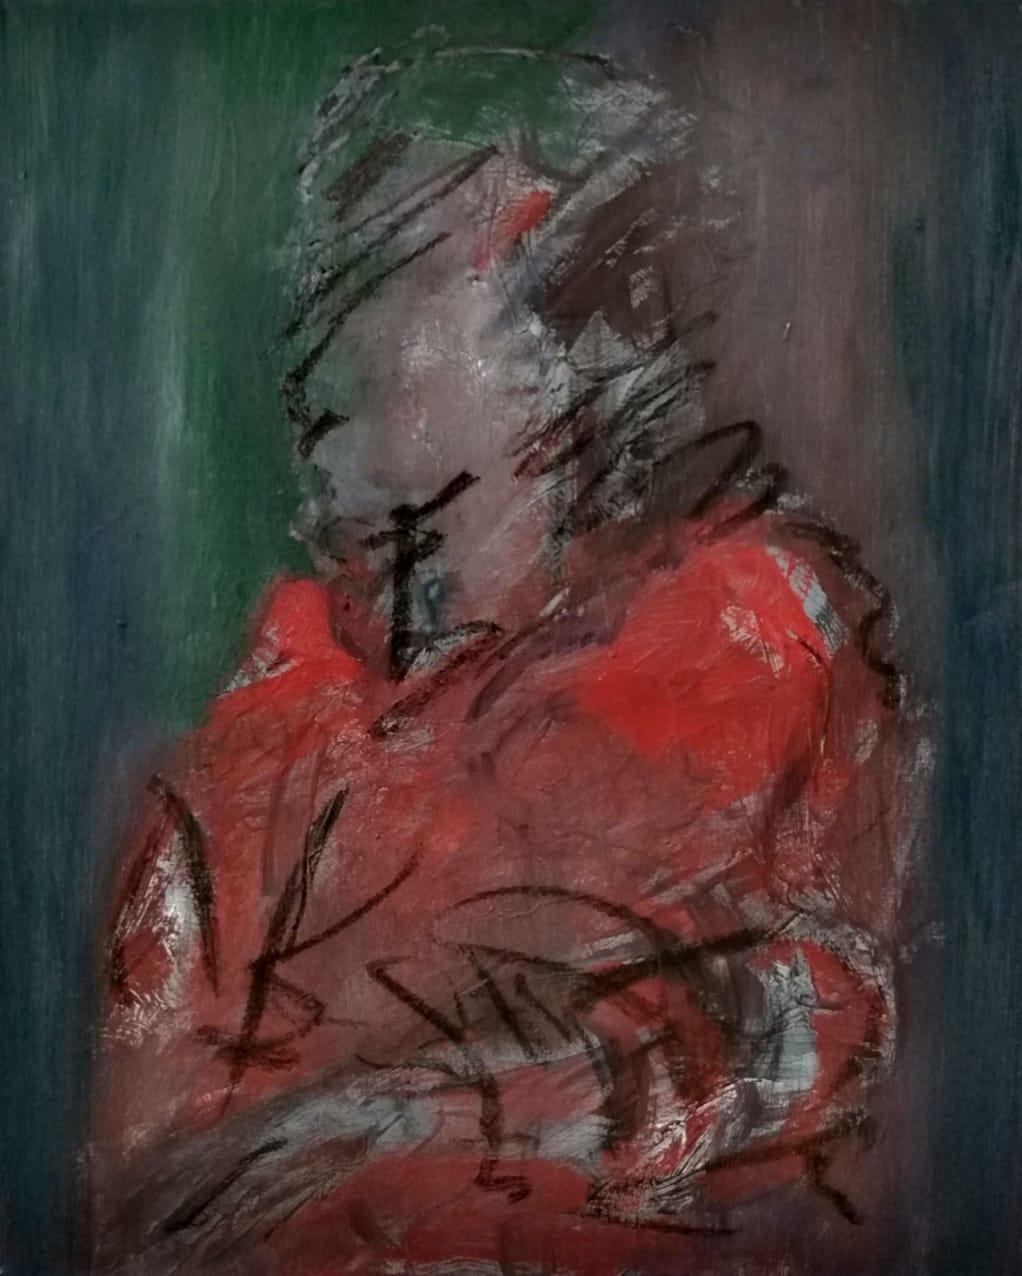 Dudu Santos, Untitled, 2018